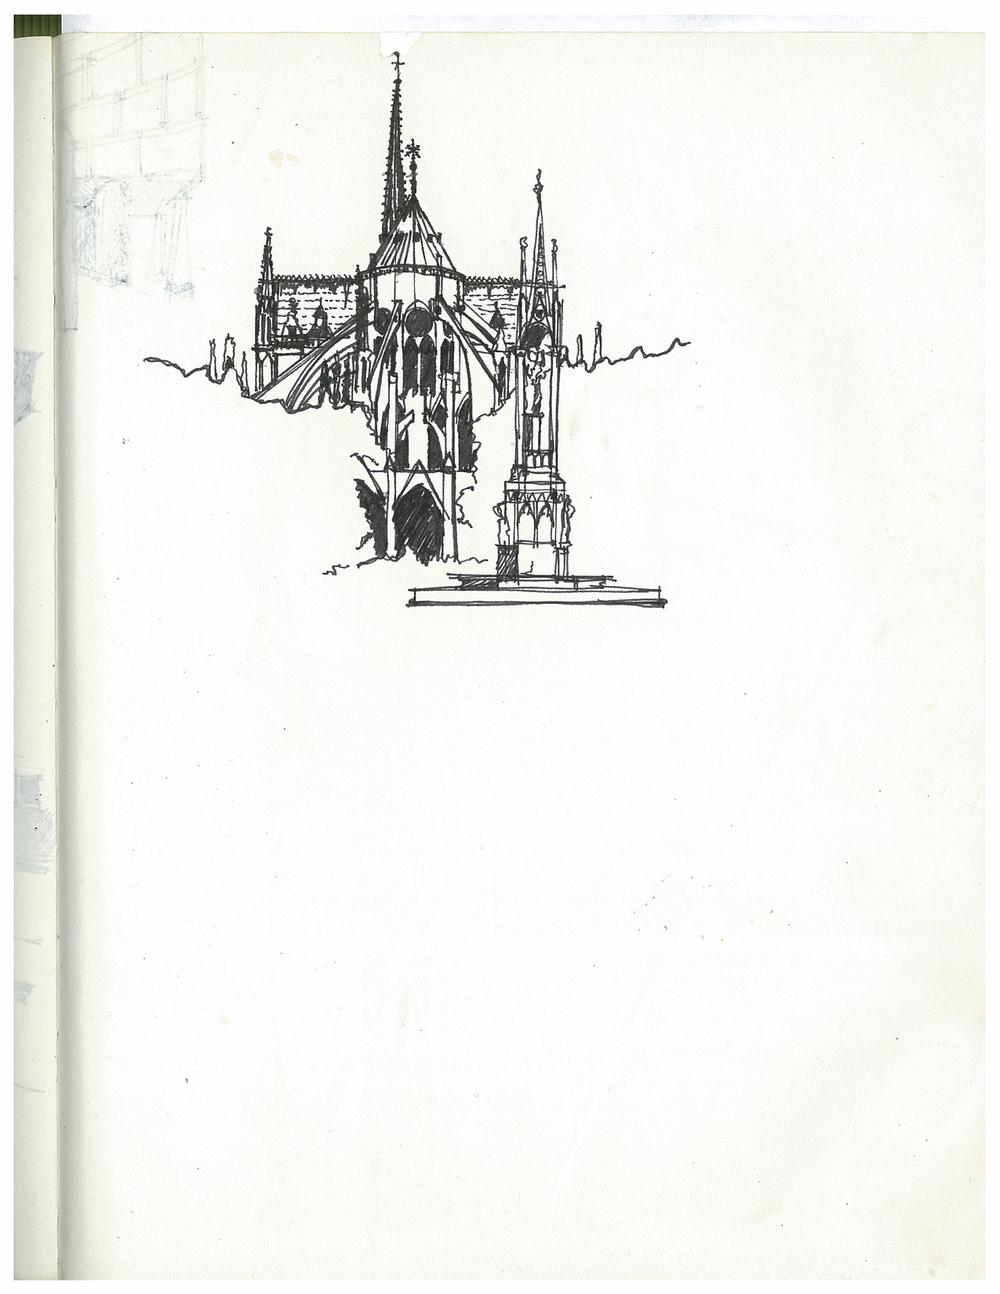 1980 - 59 Notre Dame.jpg